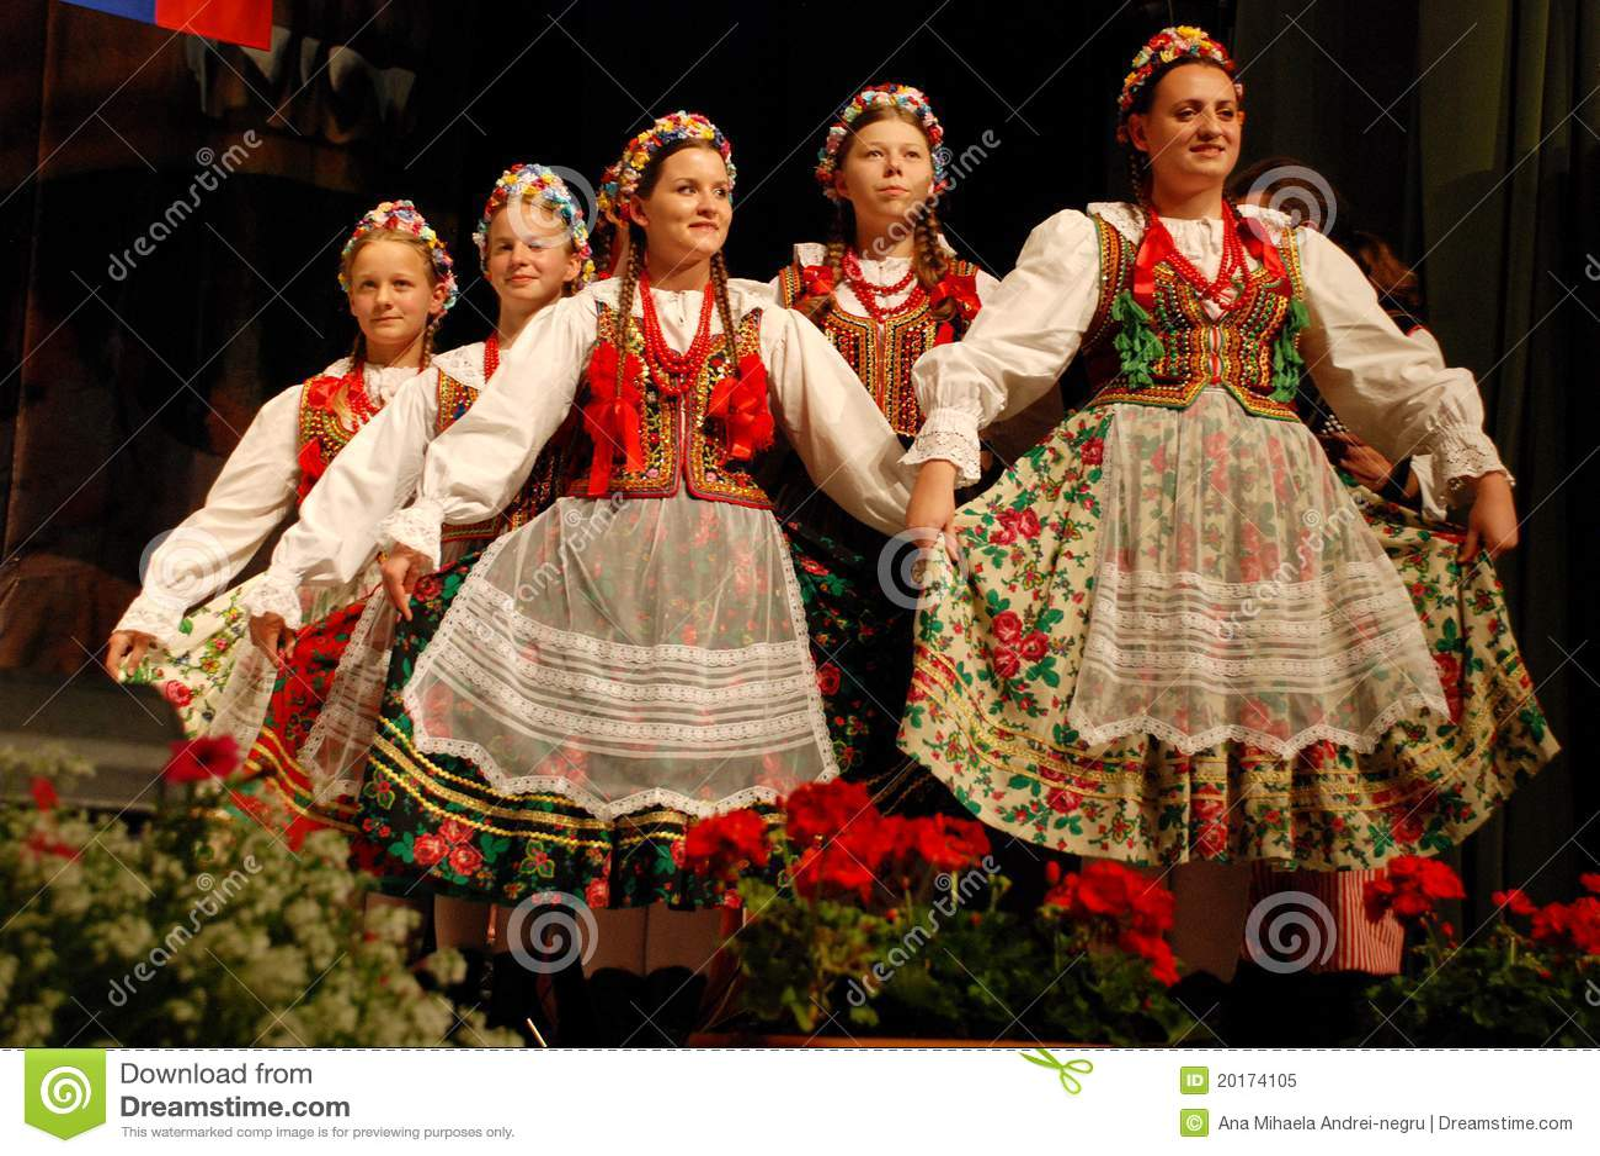 Traje popular polaco Traje Traje popular popular polaco polaco Traje popular 2IED9H